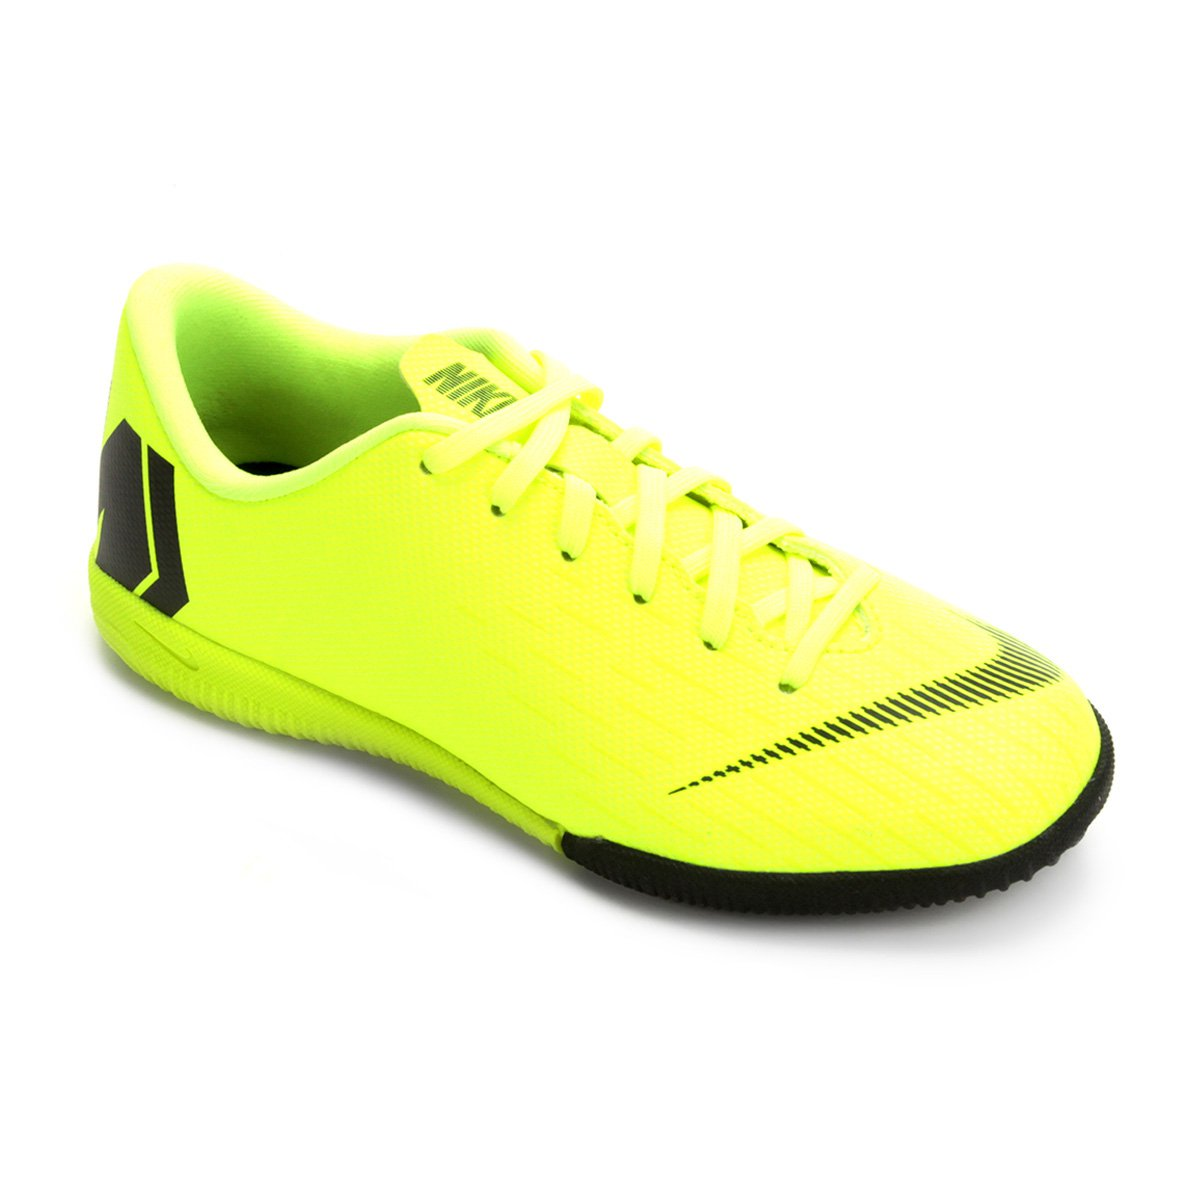 368477ab2e0b5 Chuteira Futsal Infantil Nike Mercurial Vapor 12 Academy GS IC | Loja do  Inter